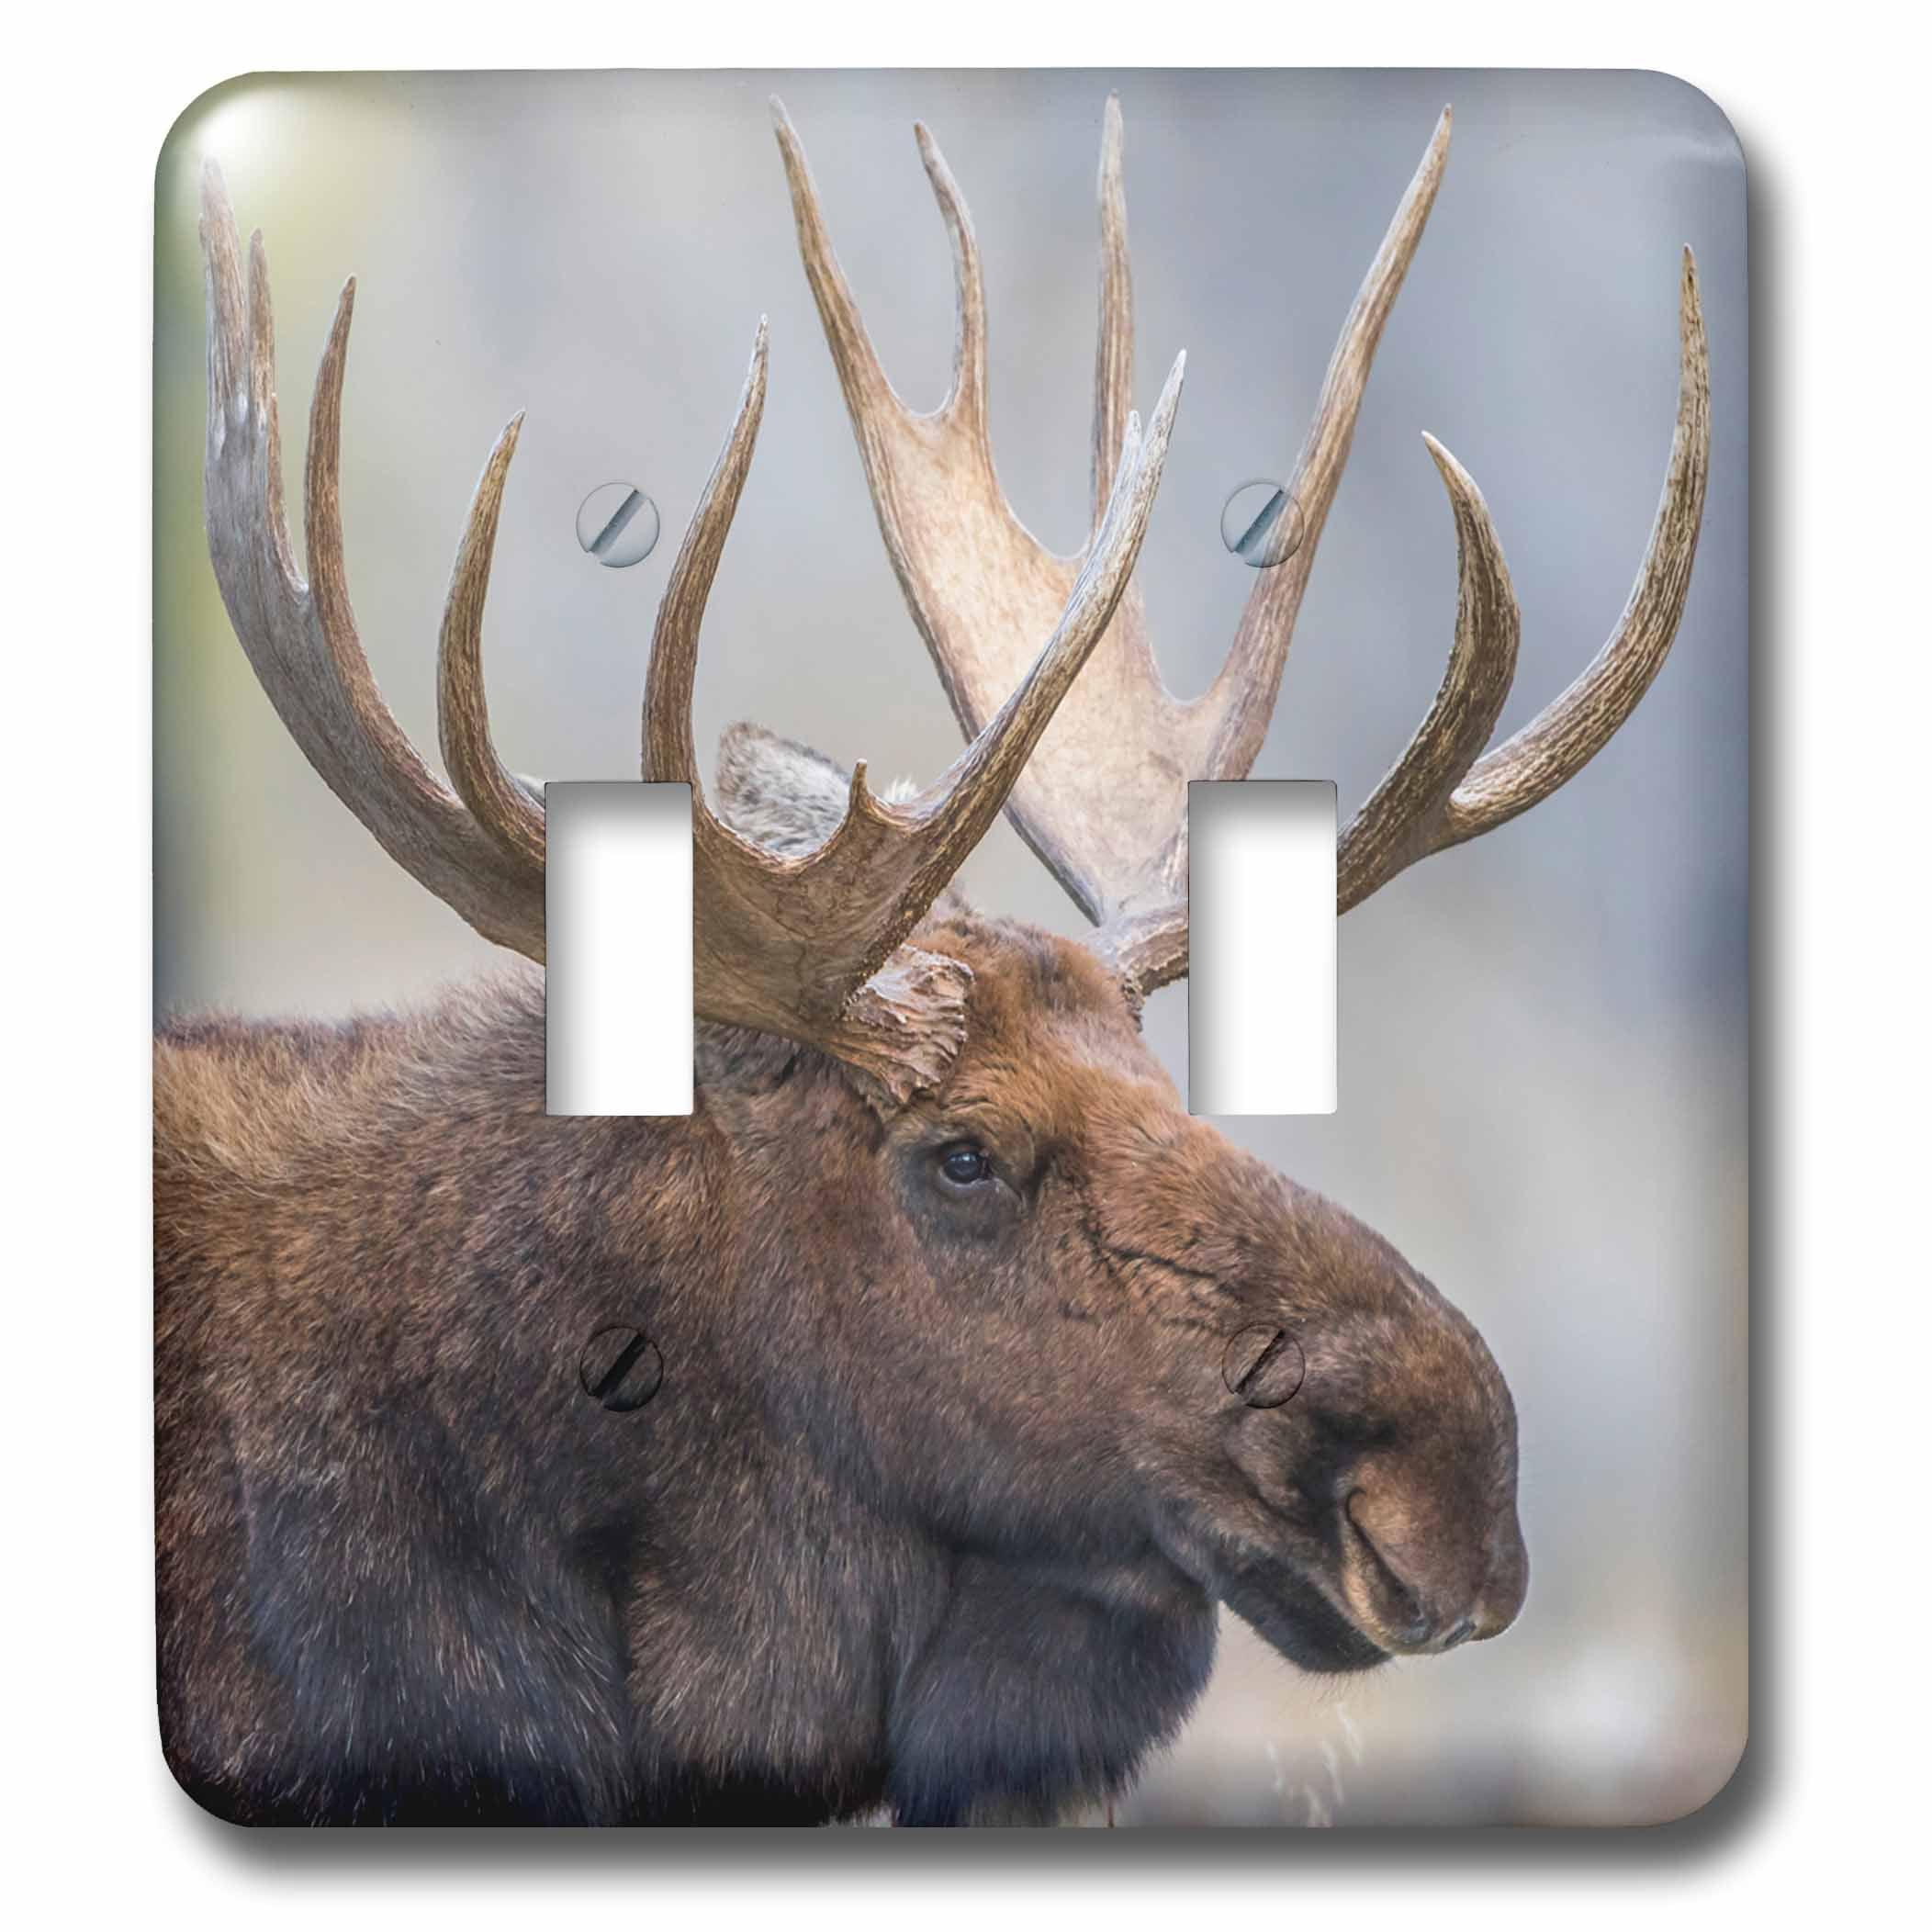 3drose Usa Wyoming Grand Teton Np Bull Moose Poses For A Portrait Double Toggle Switch Lsp 260628 2 Walmart Com Walmart Com